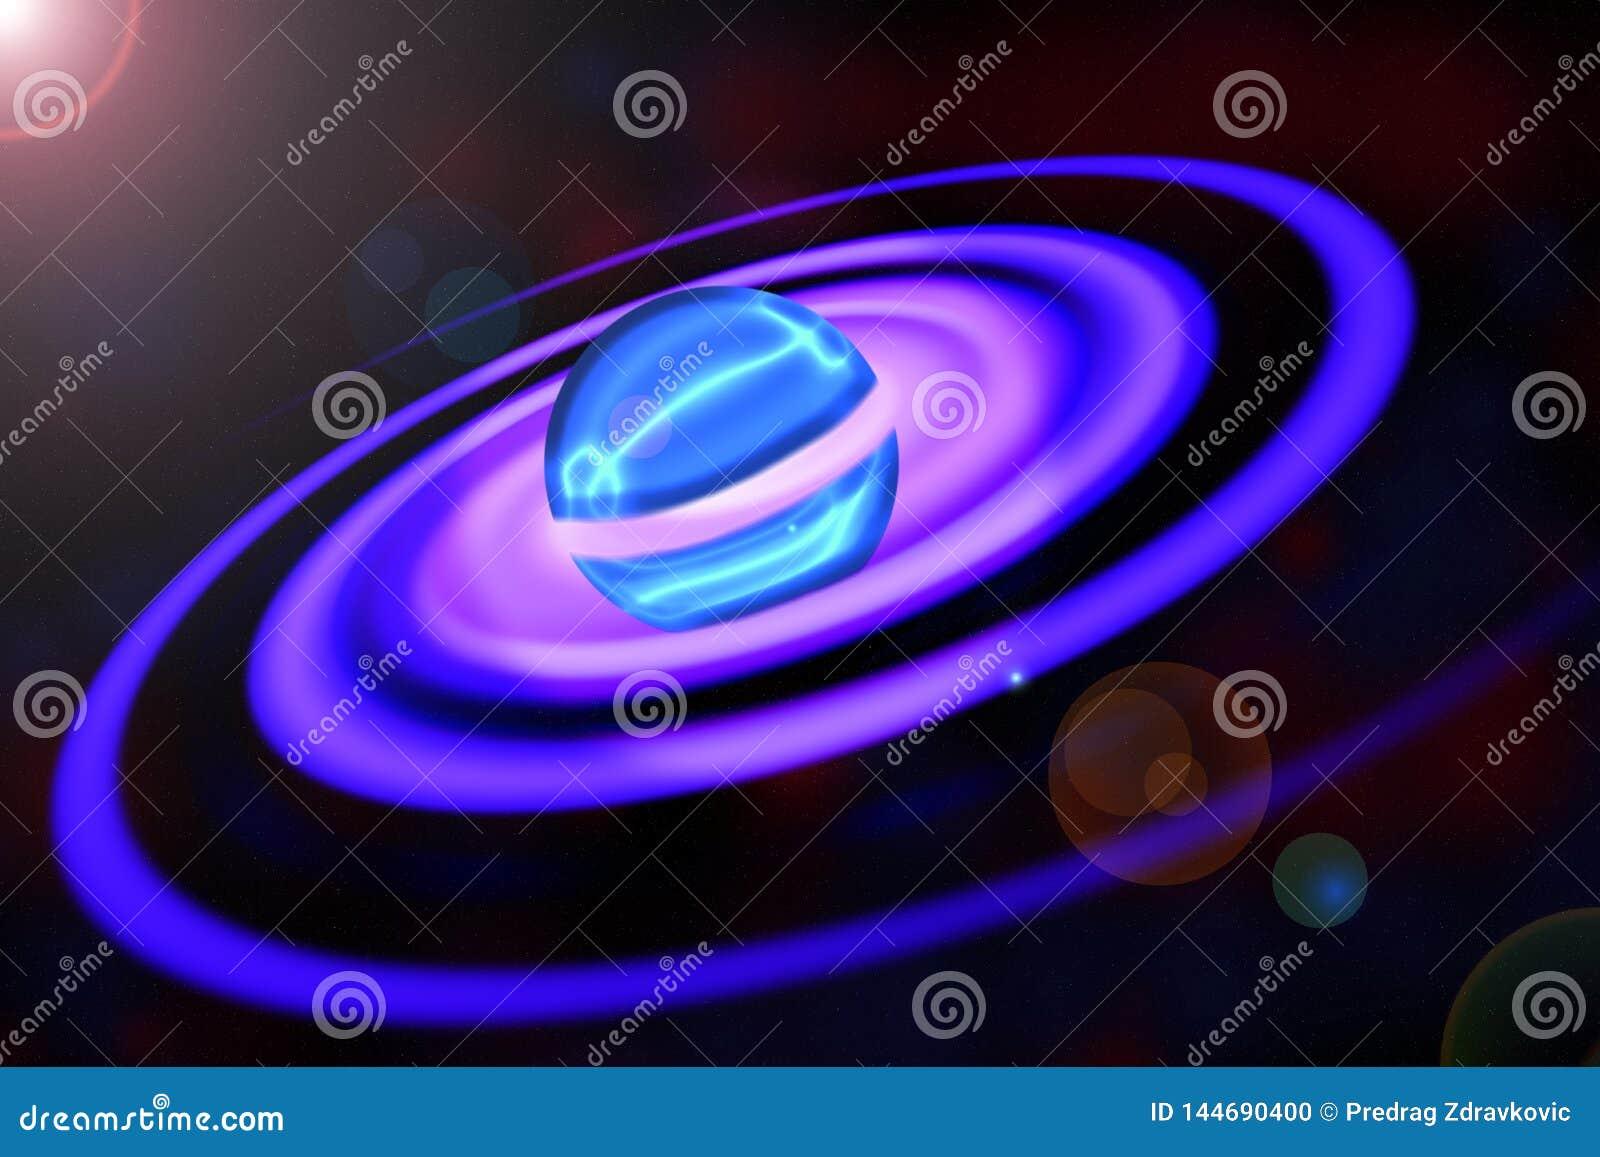 Planeta espectacular con los anillos espirales